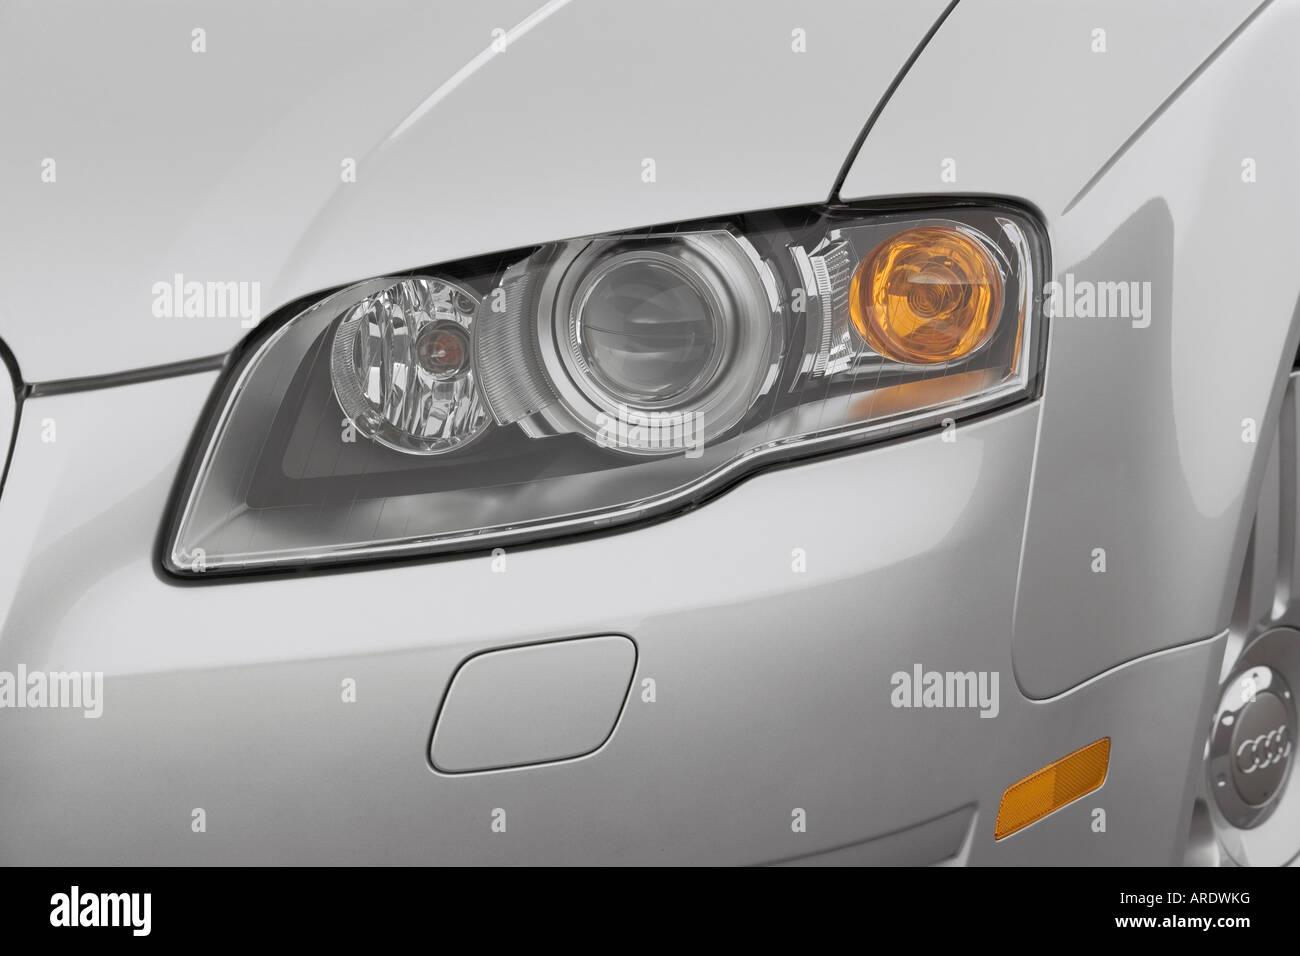 Audi A T Quattro Stock Photos Audi A T Quattro - 2007 audi a4 headlights